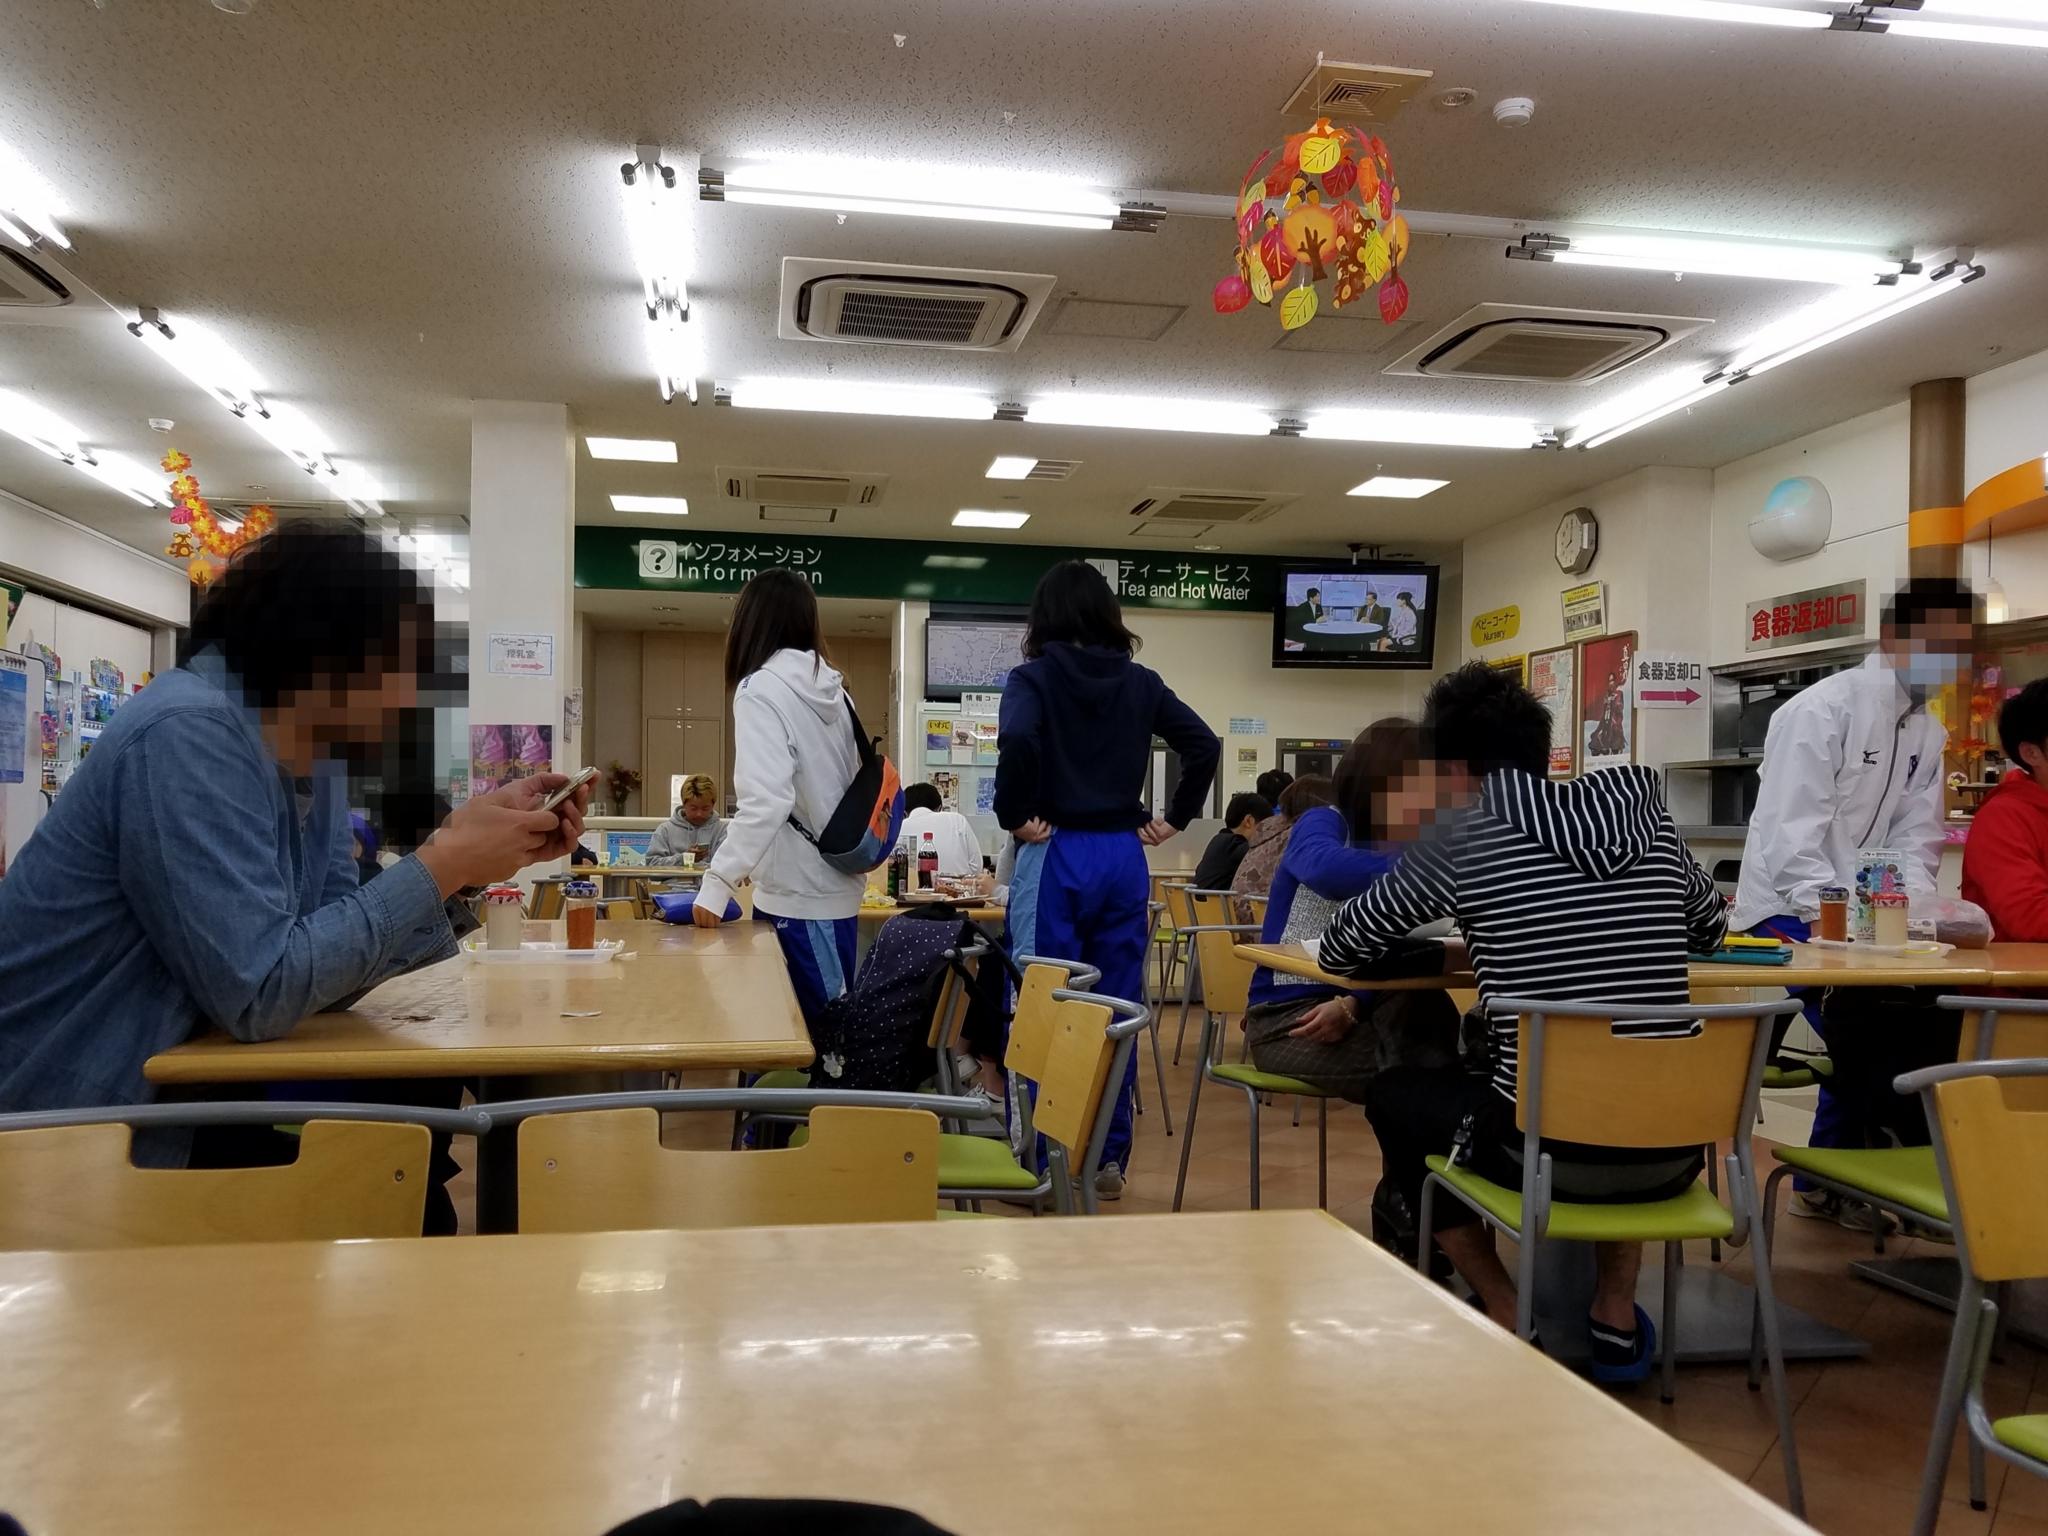 f:id:ToshUeno:20161021195801j:plain